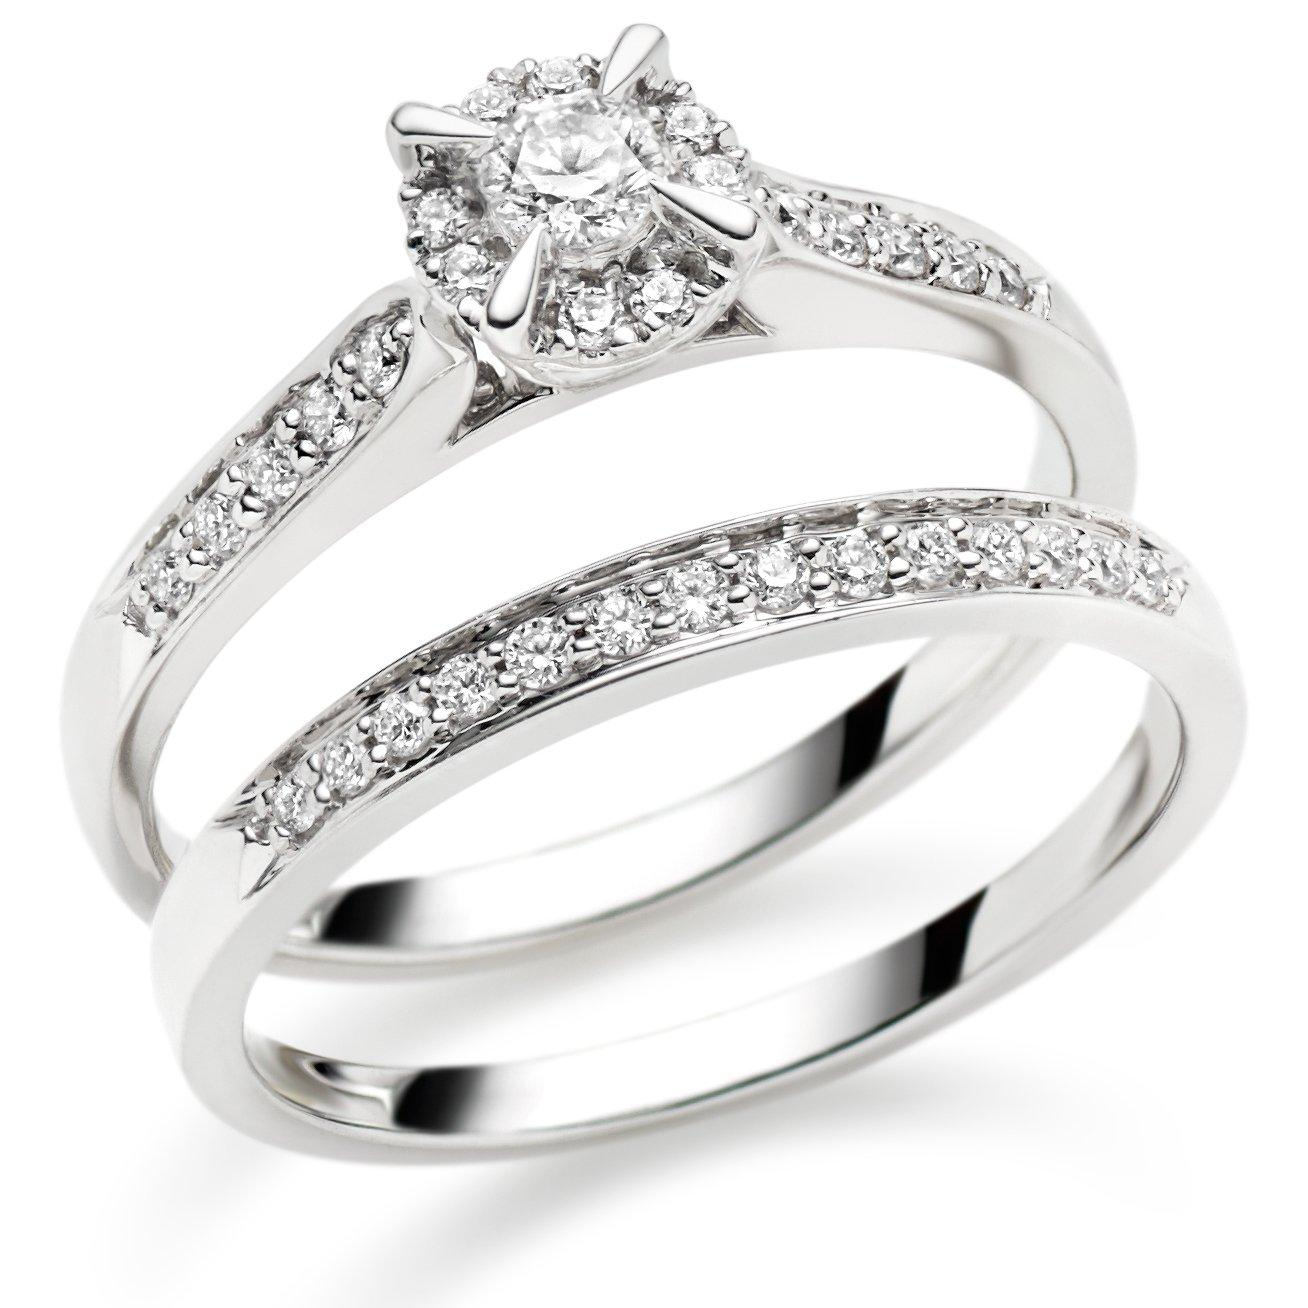 18ct White Gold Diamond Ring Set